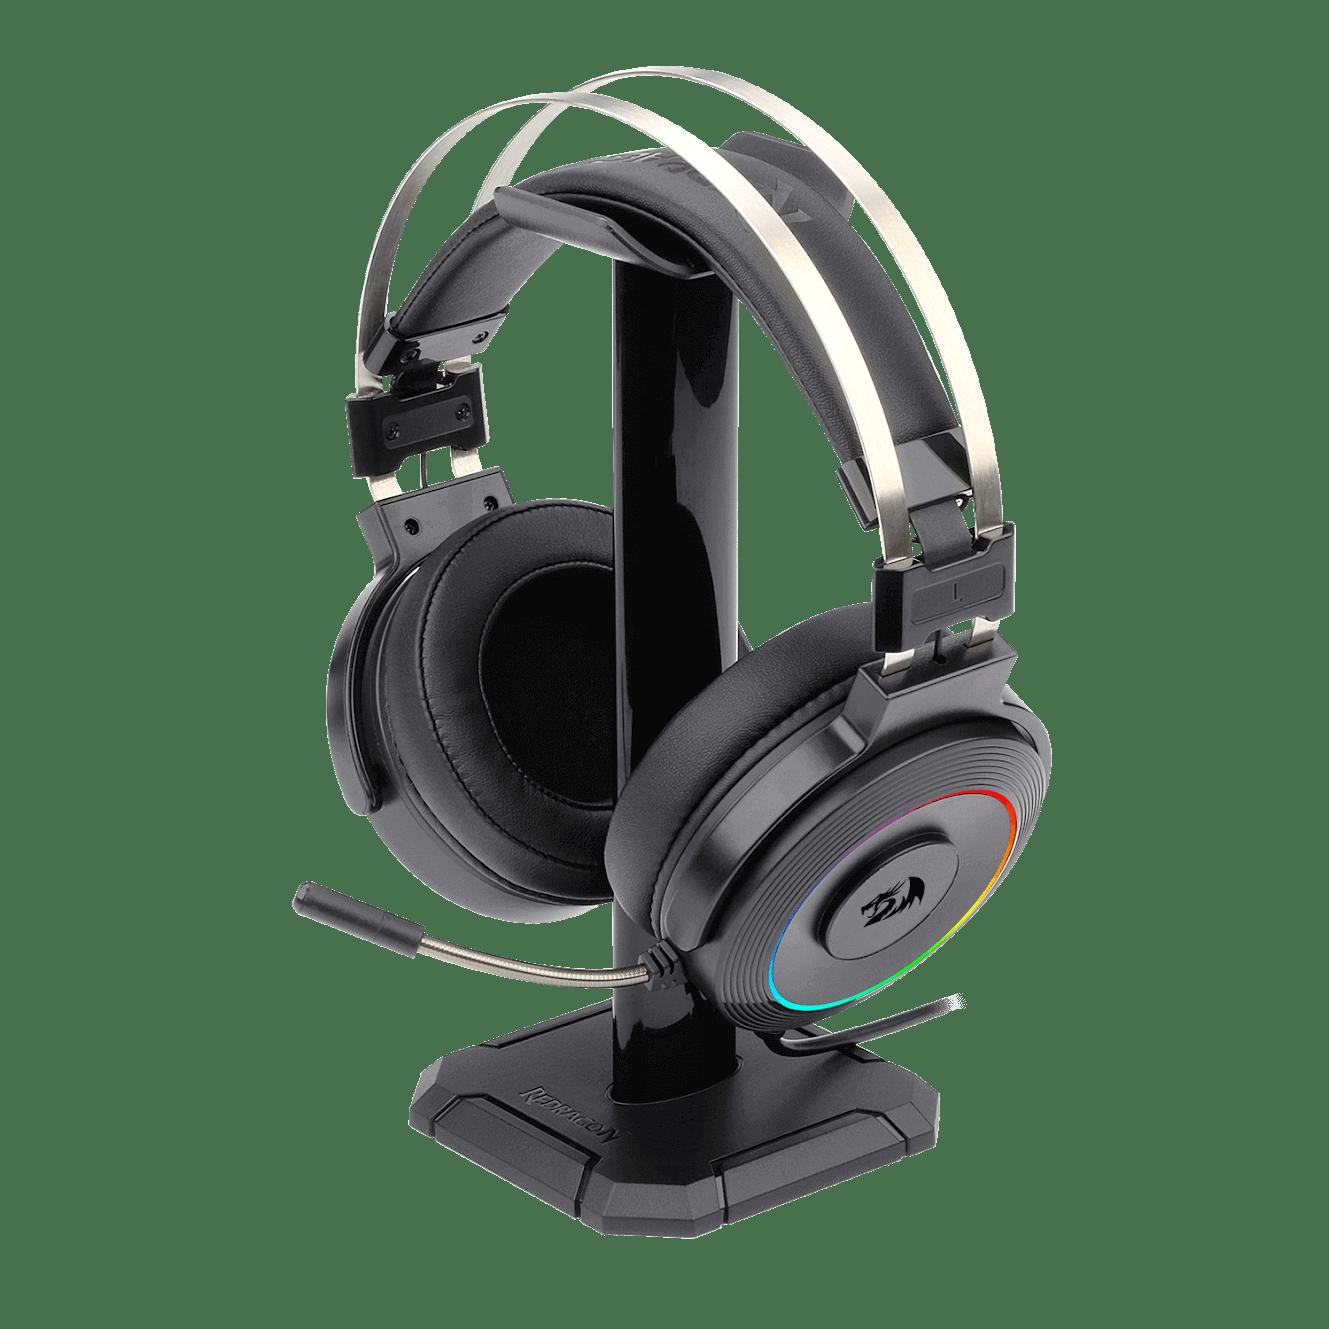 HEADSET GAMER REDRAGON LAMIA RGB USB AUDIO 7.1 + SUPORTE H320RGB